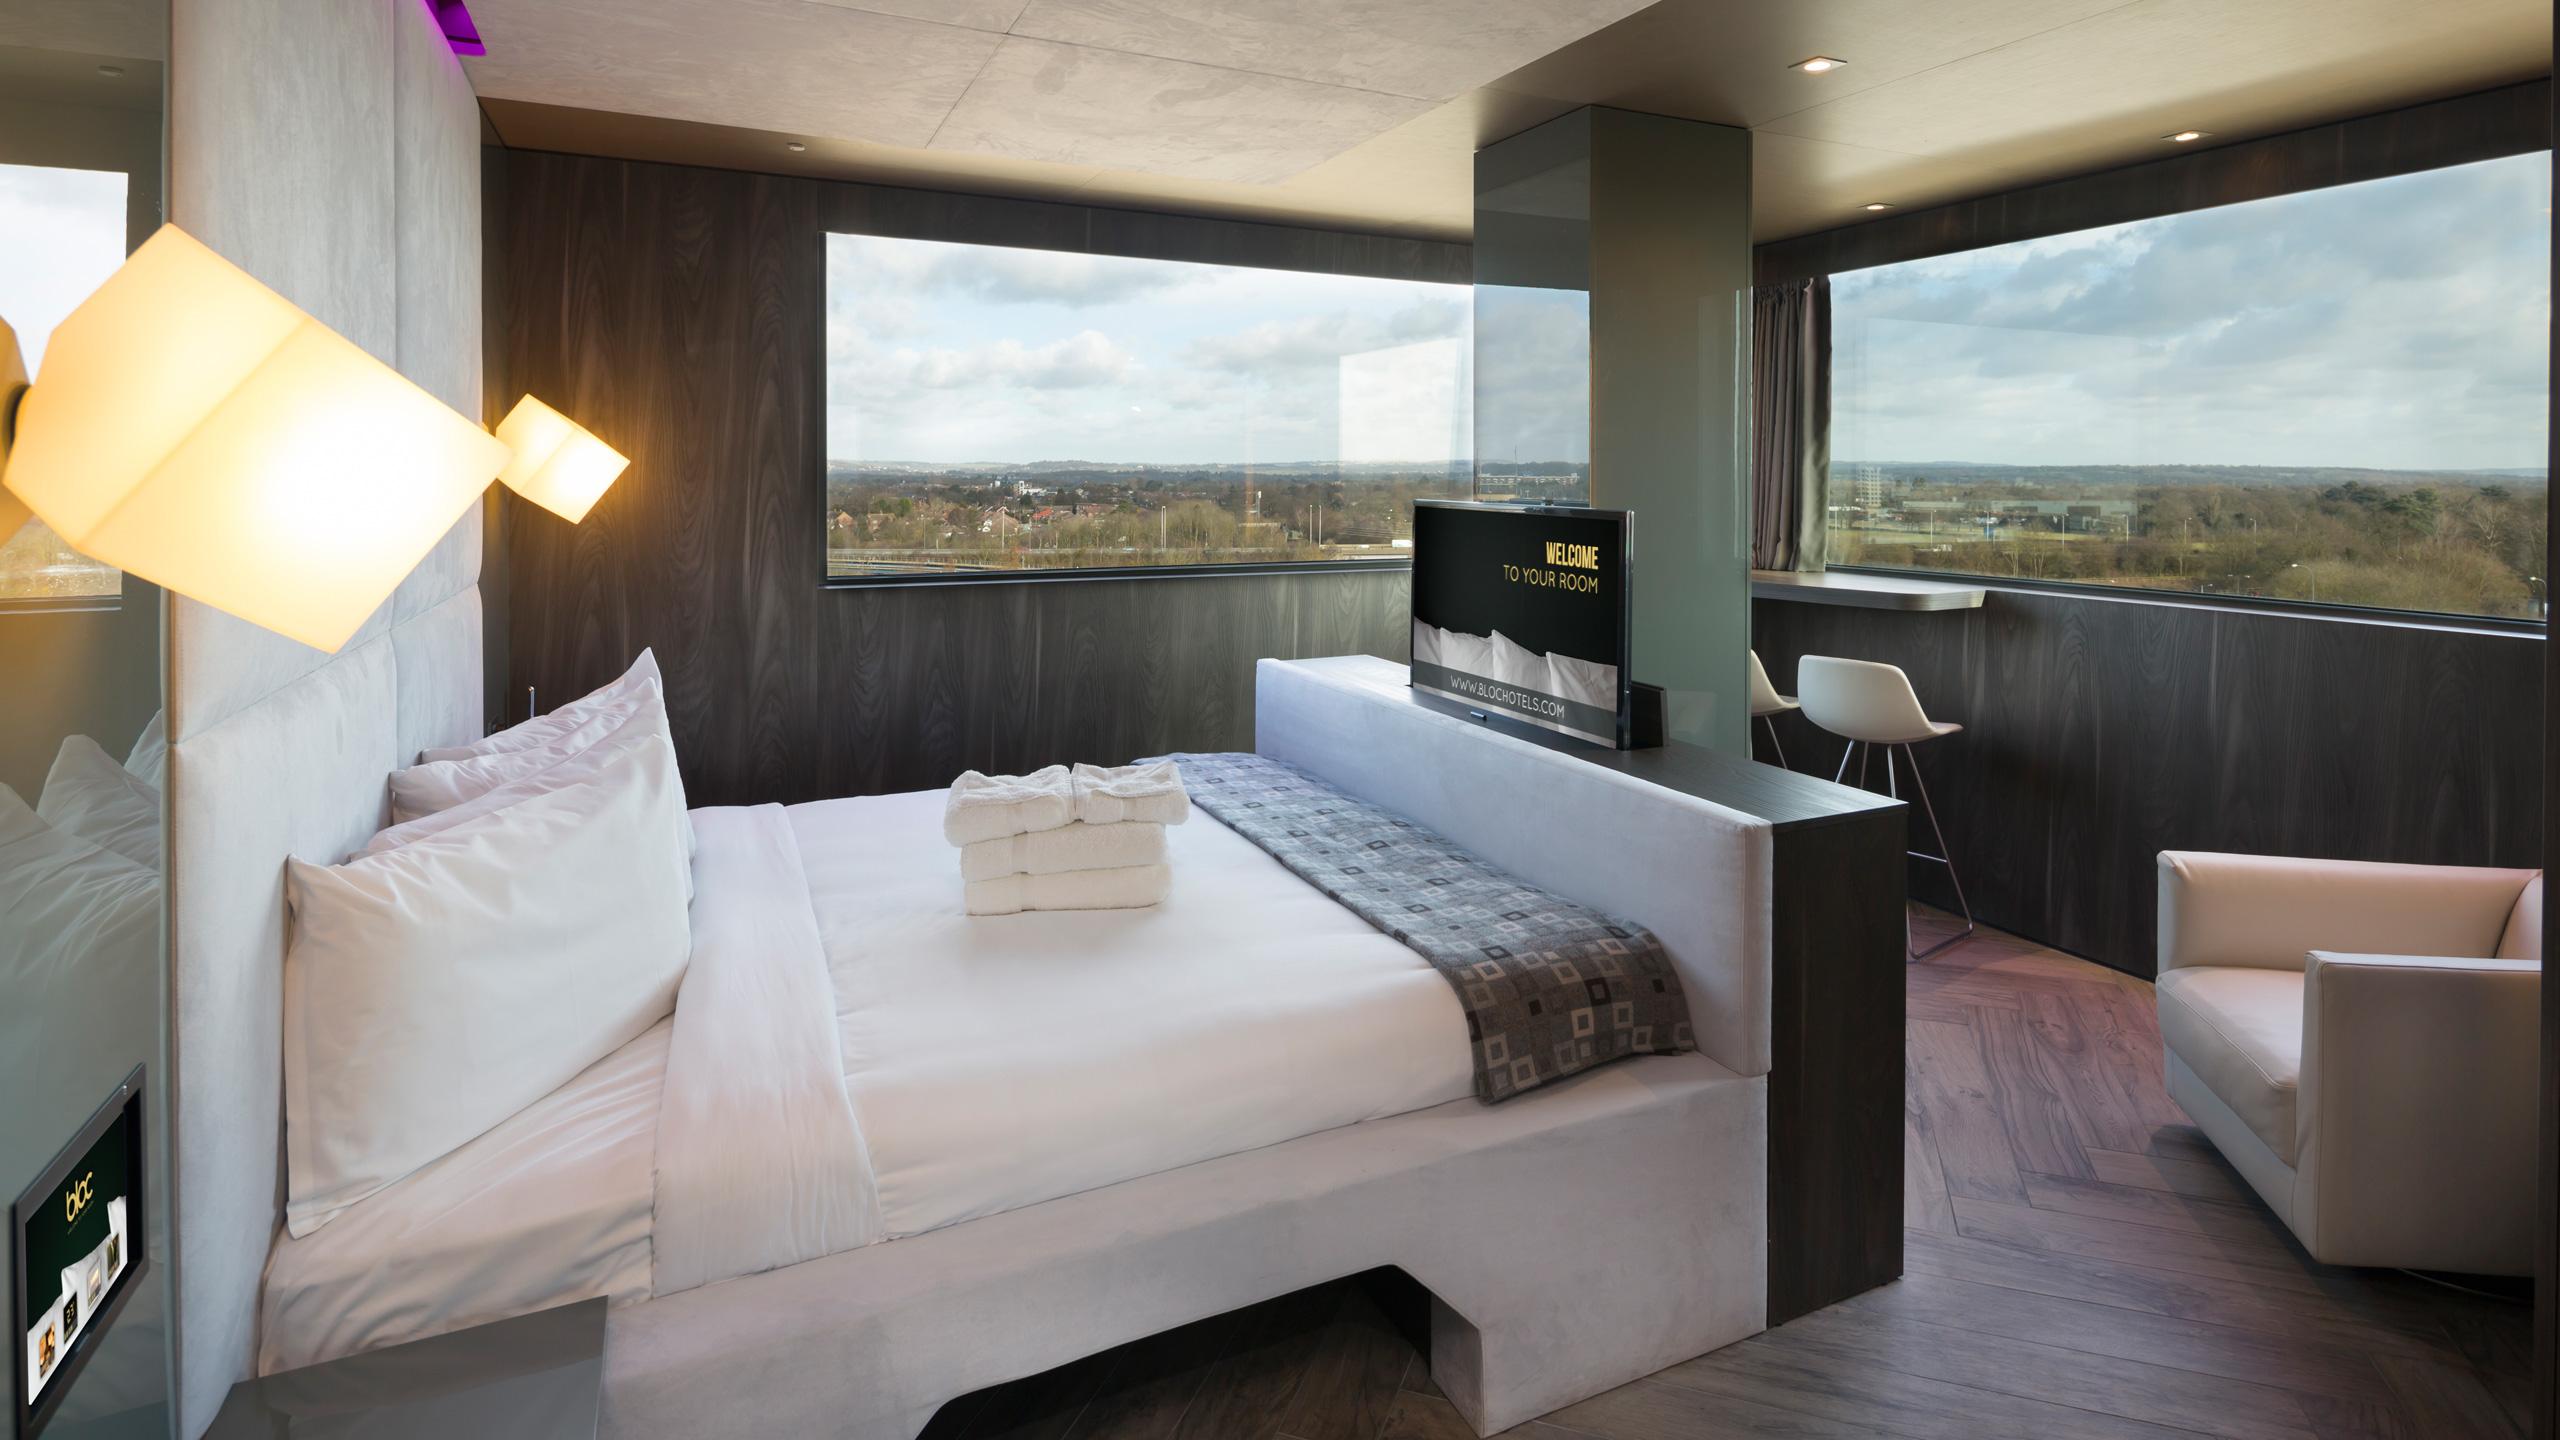 Remington Hotel Rooms